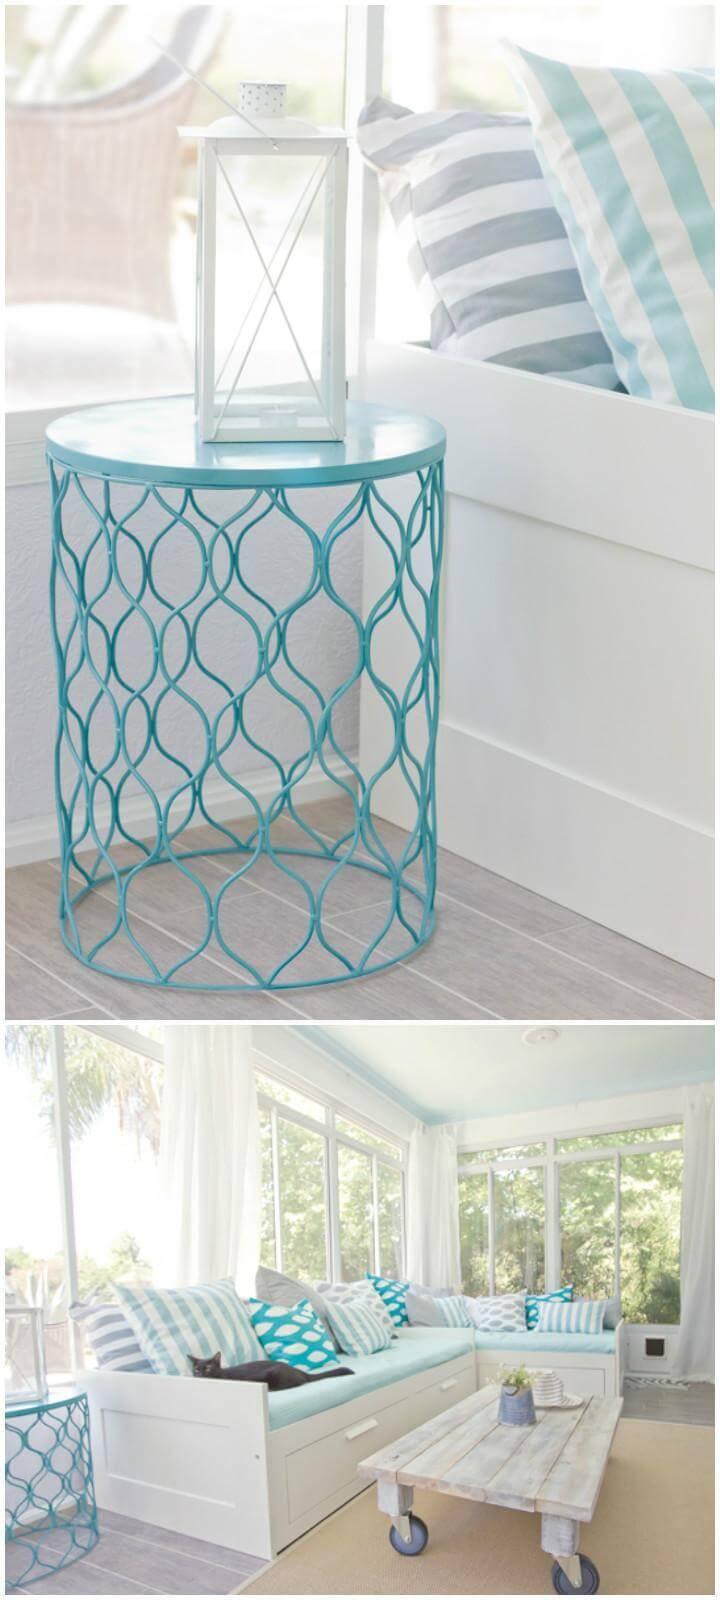 DIY Old Bin Side Table